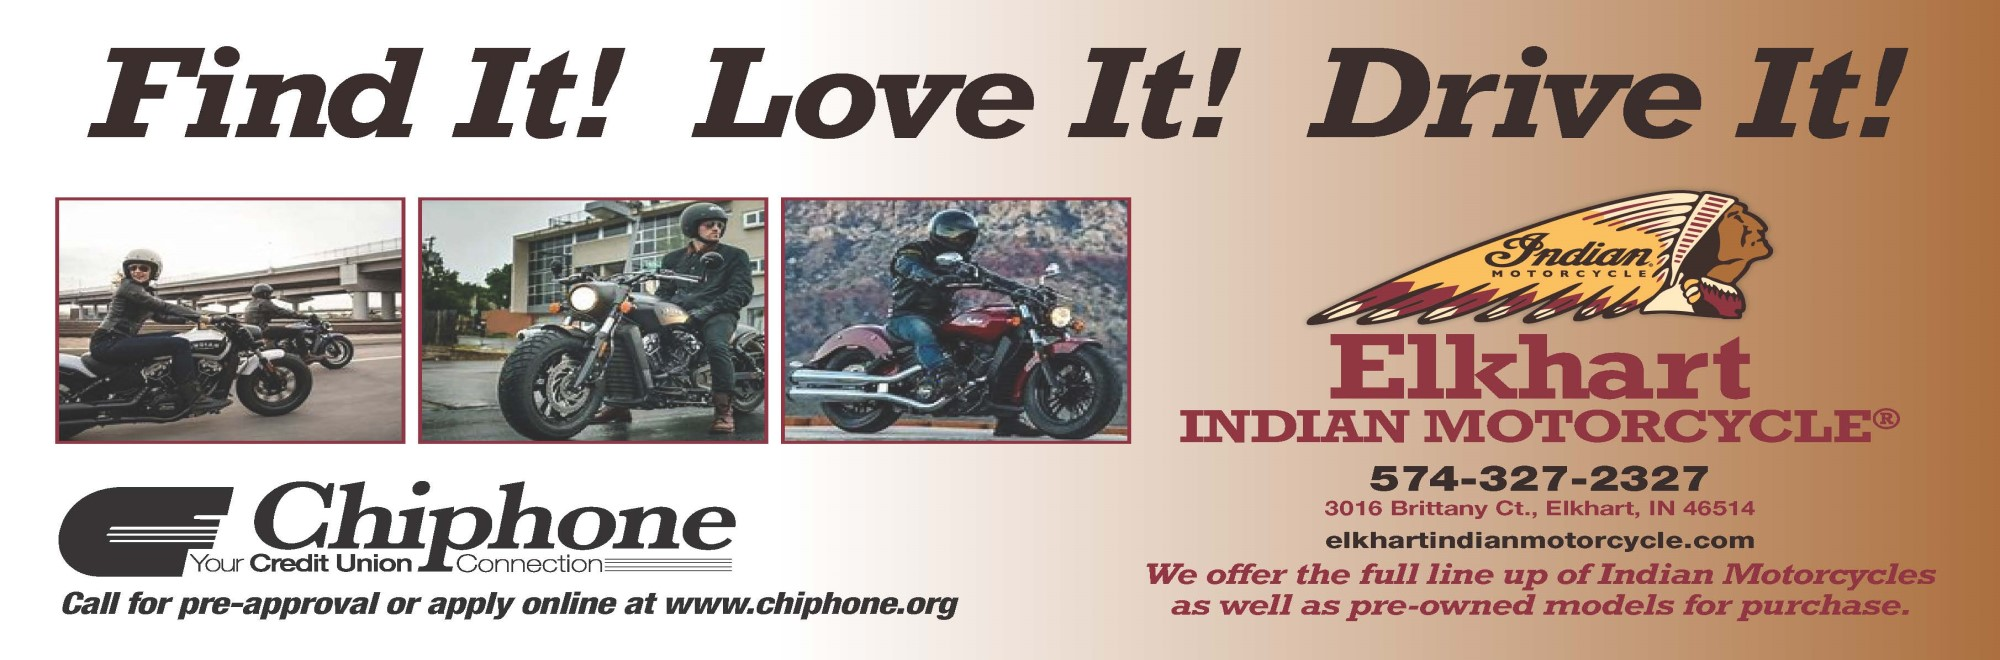 FEATURED DEALER ELKHART INDIAN MOTORCYCLE – FIND IT!  LOVE IT!  RIDE IT!